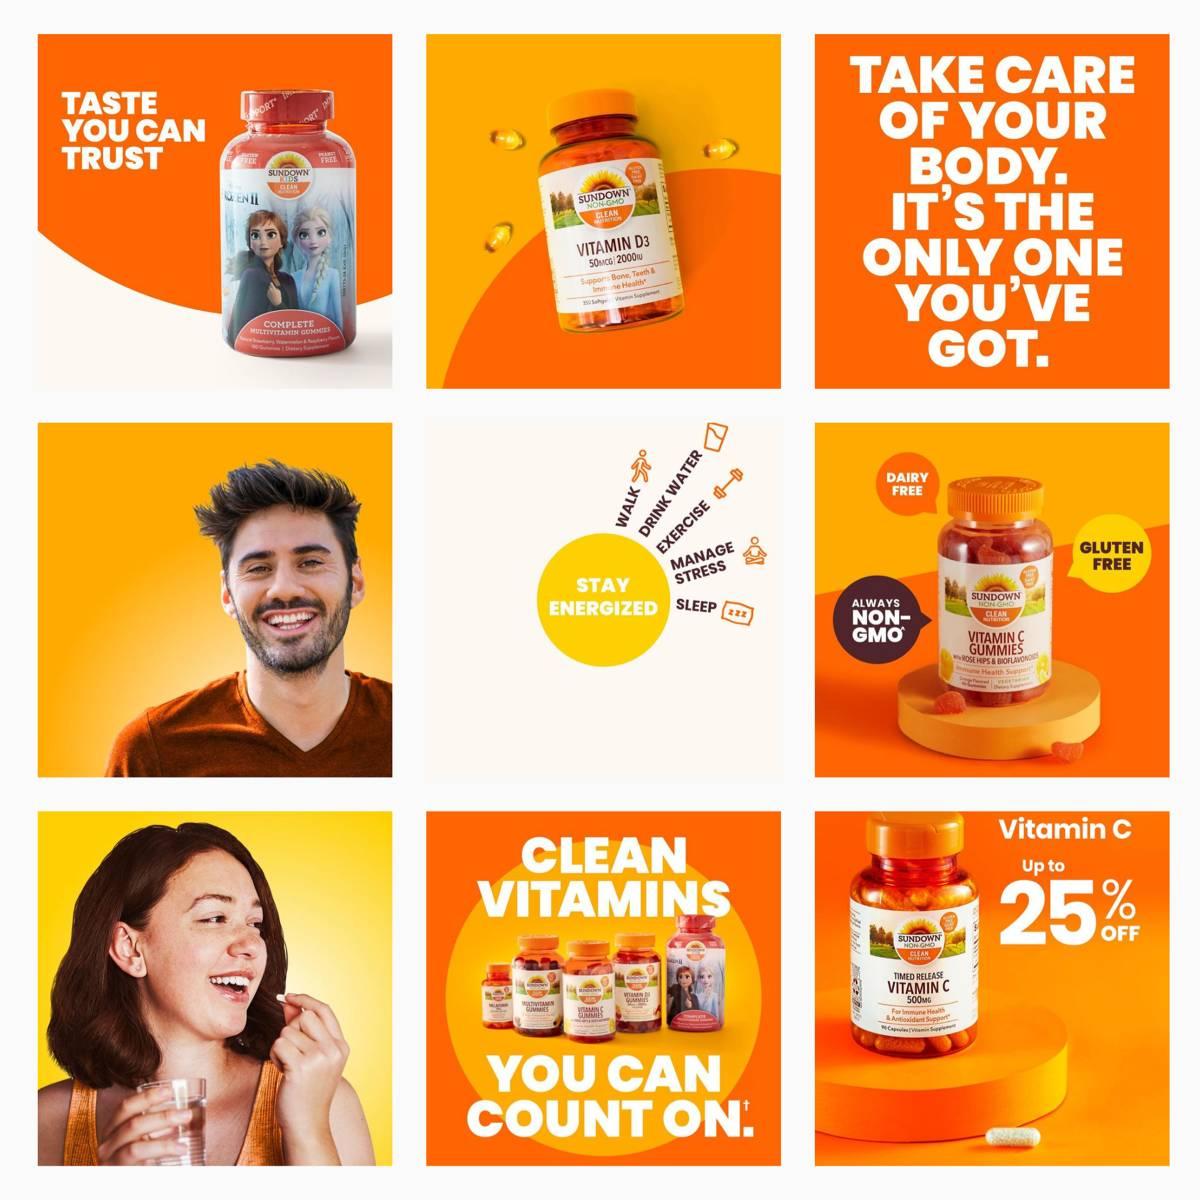 Sundowns Nutritions Instagram grid after BSTRO